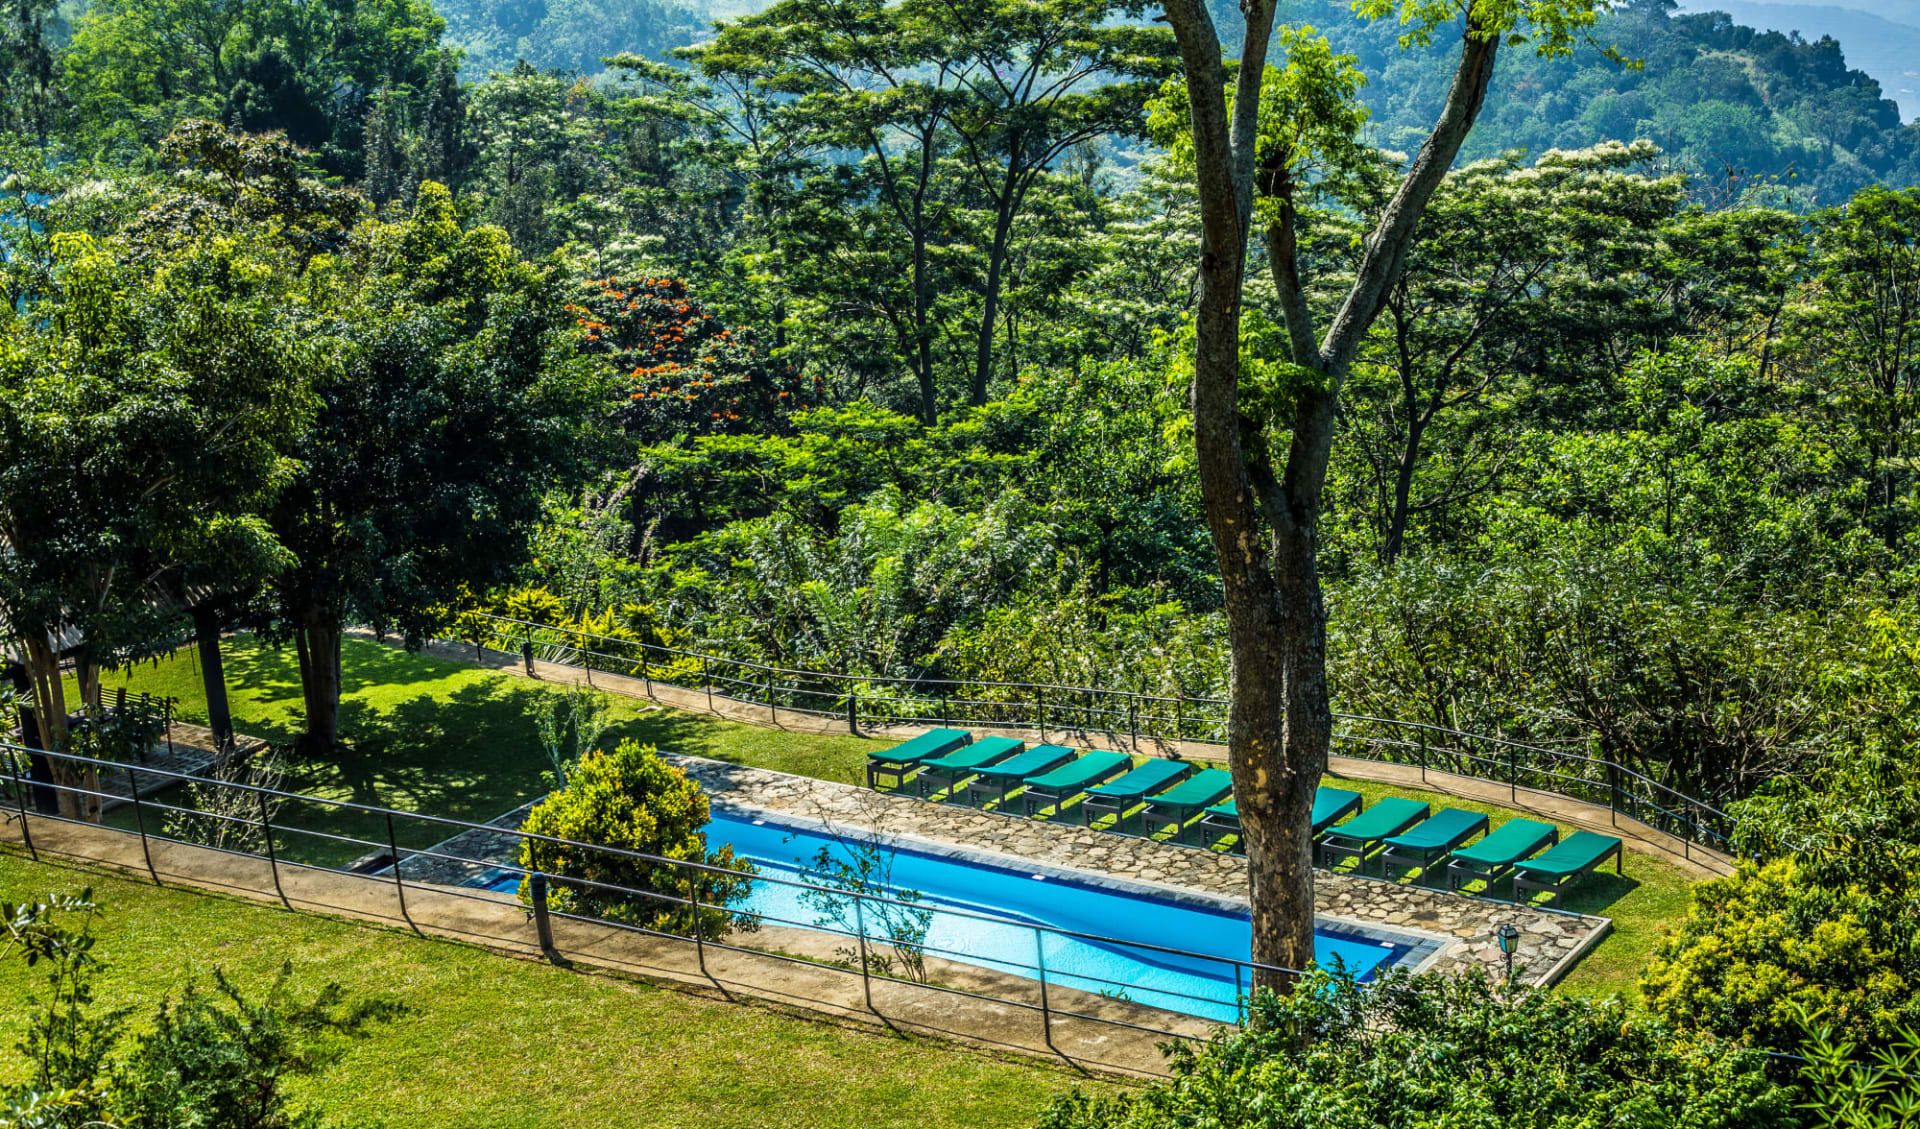 Melheim Resort in Ella, Haputale, Koslanda: Garden with Pool